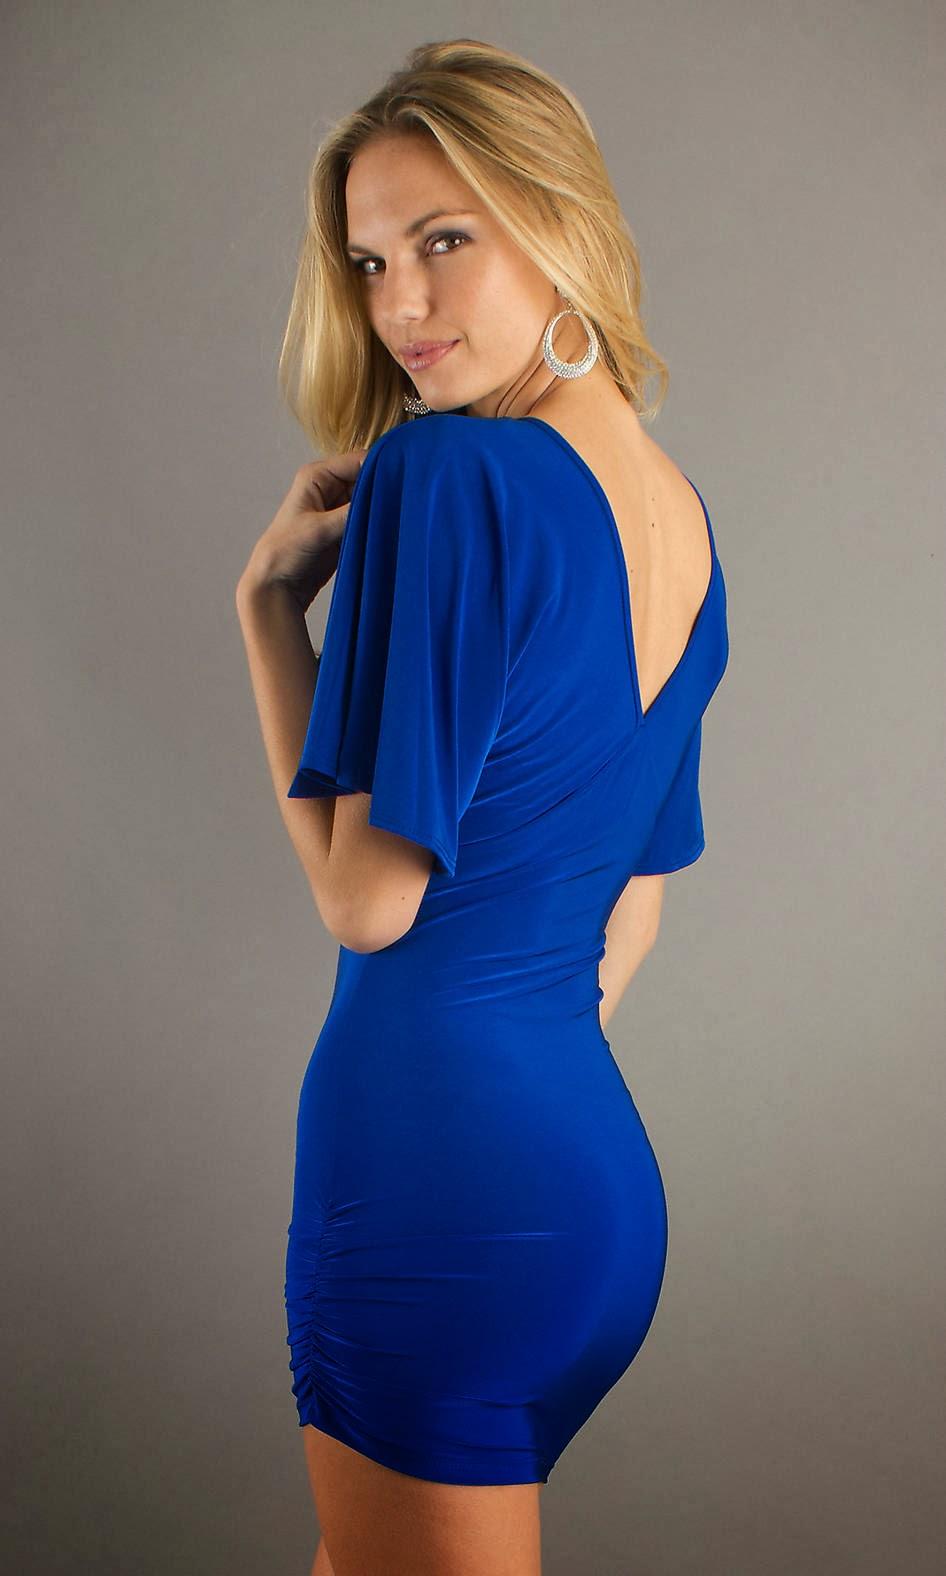 BEAUTY AND FASHION SHORT ROYAL BLUE DRESS